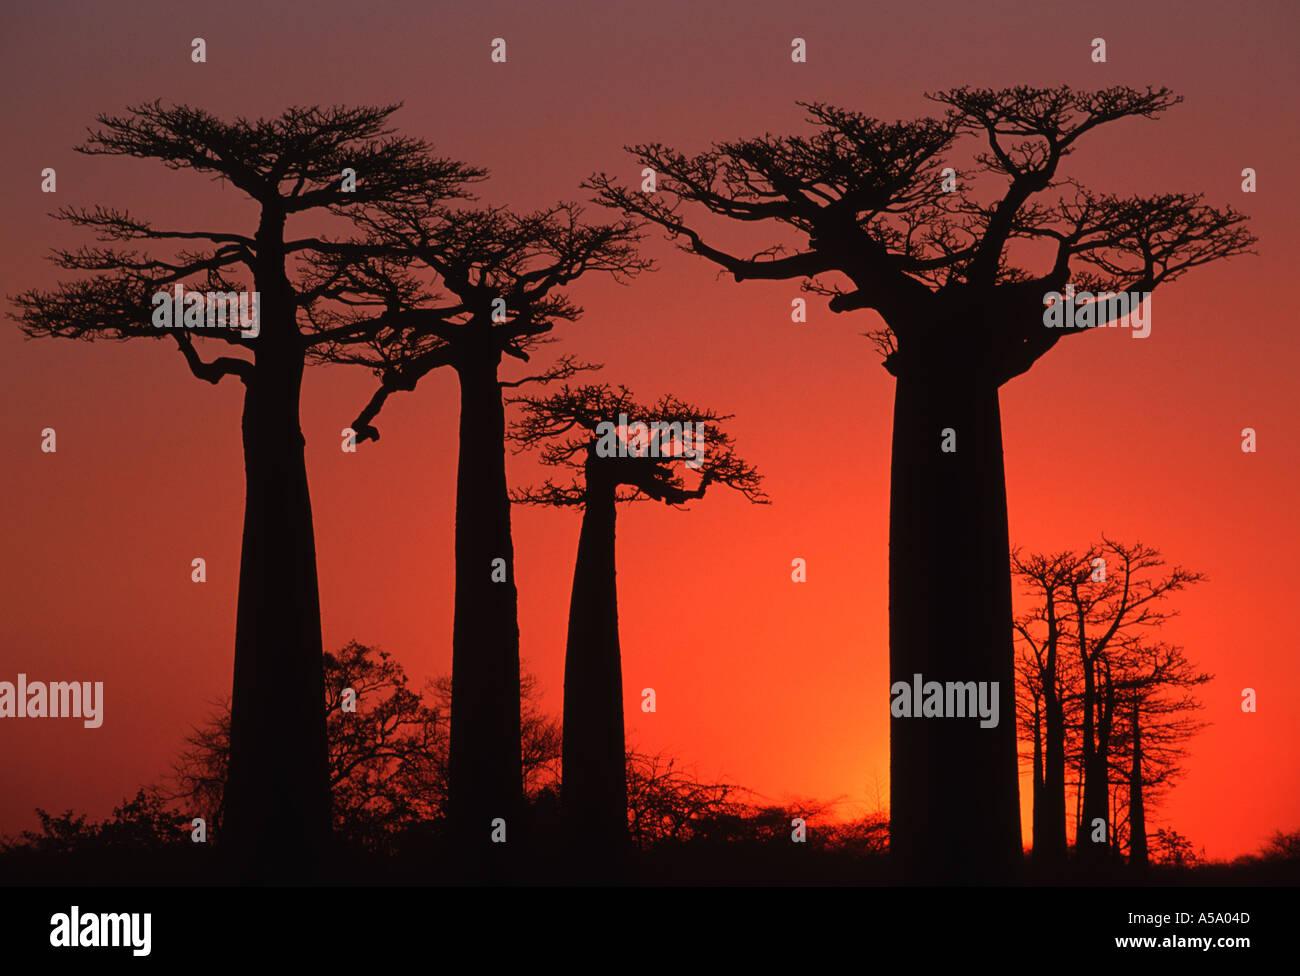 Baobab Baum Affenbrotbäume Grandidieri bei Sonnenuntergang in der Nähe von Morondava Madagaskar Stockbild